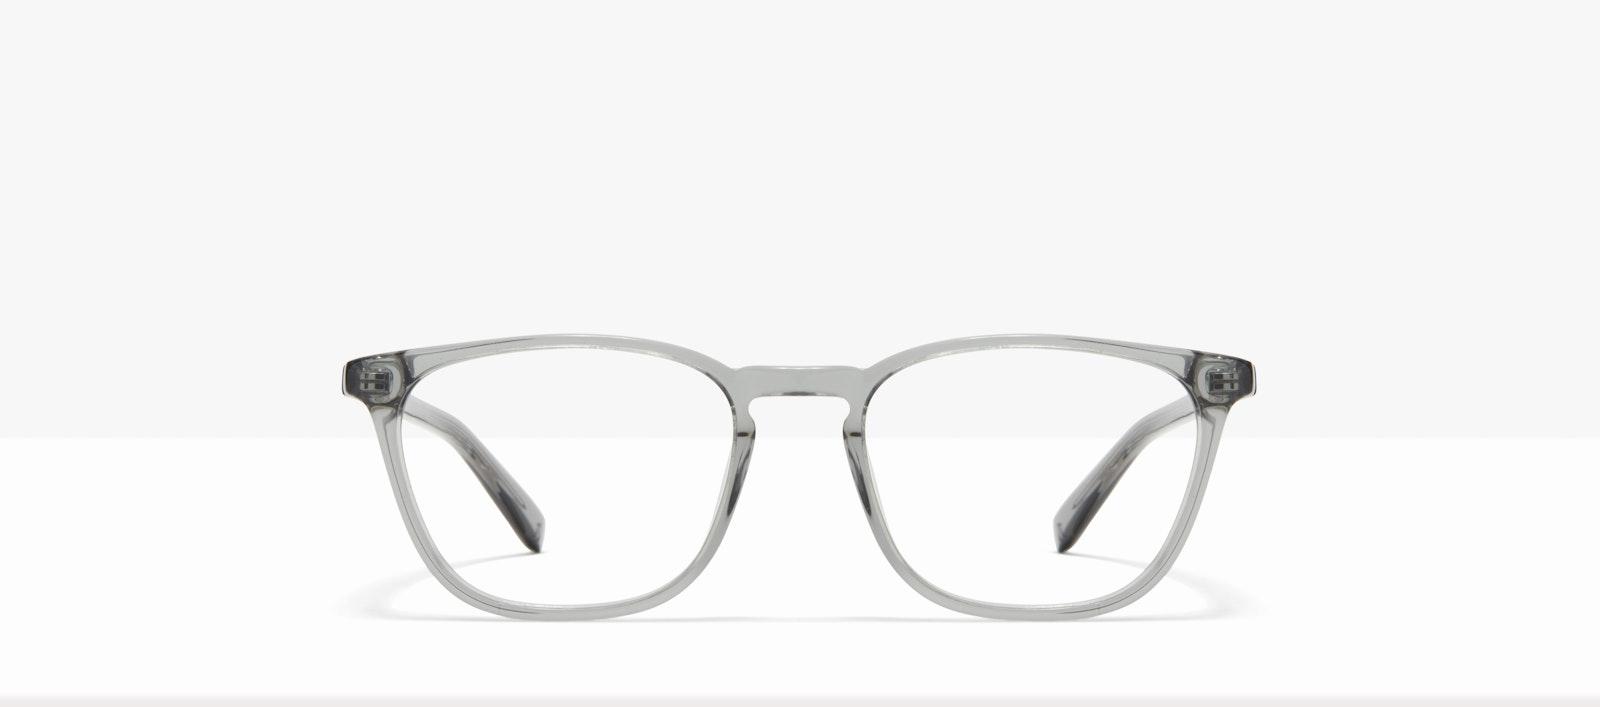 Affordable Fashion Glasses Square Eyeglasses Men Louise XL Storm Front